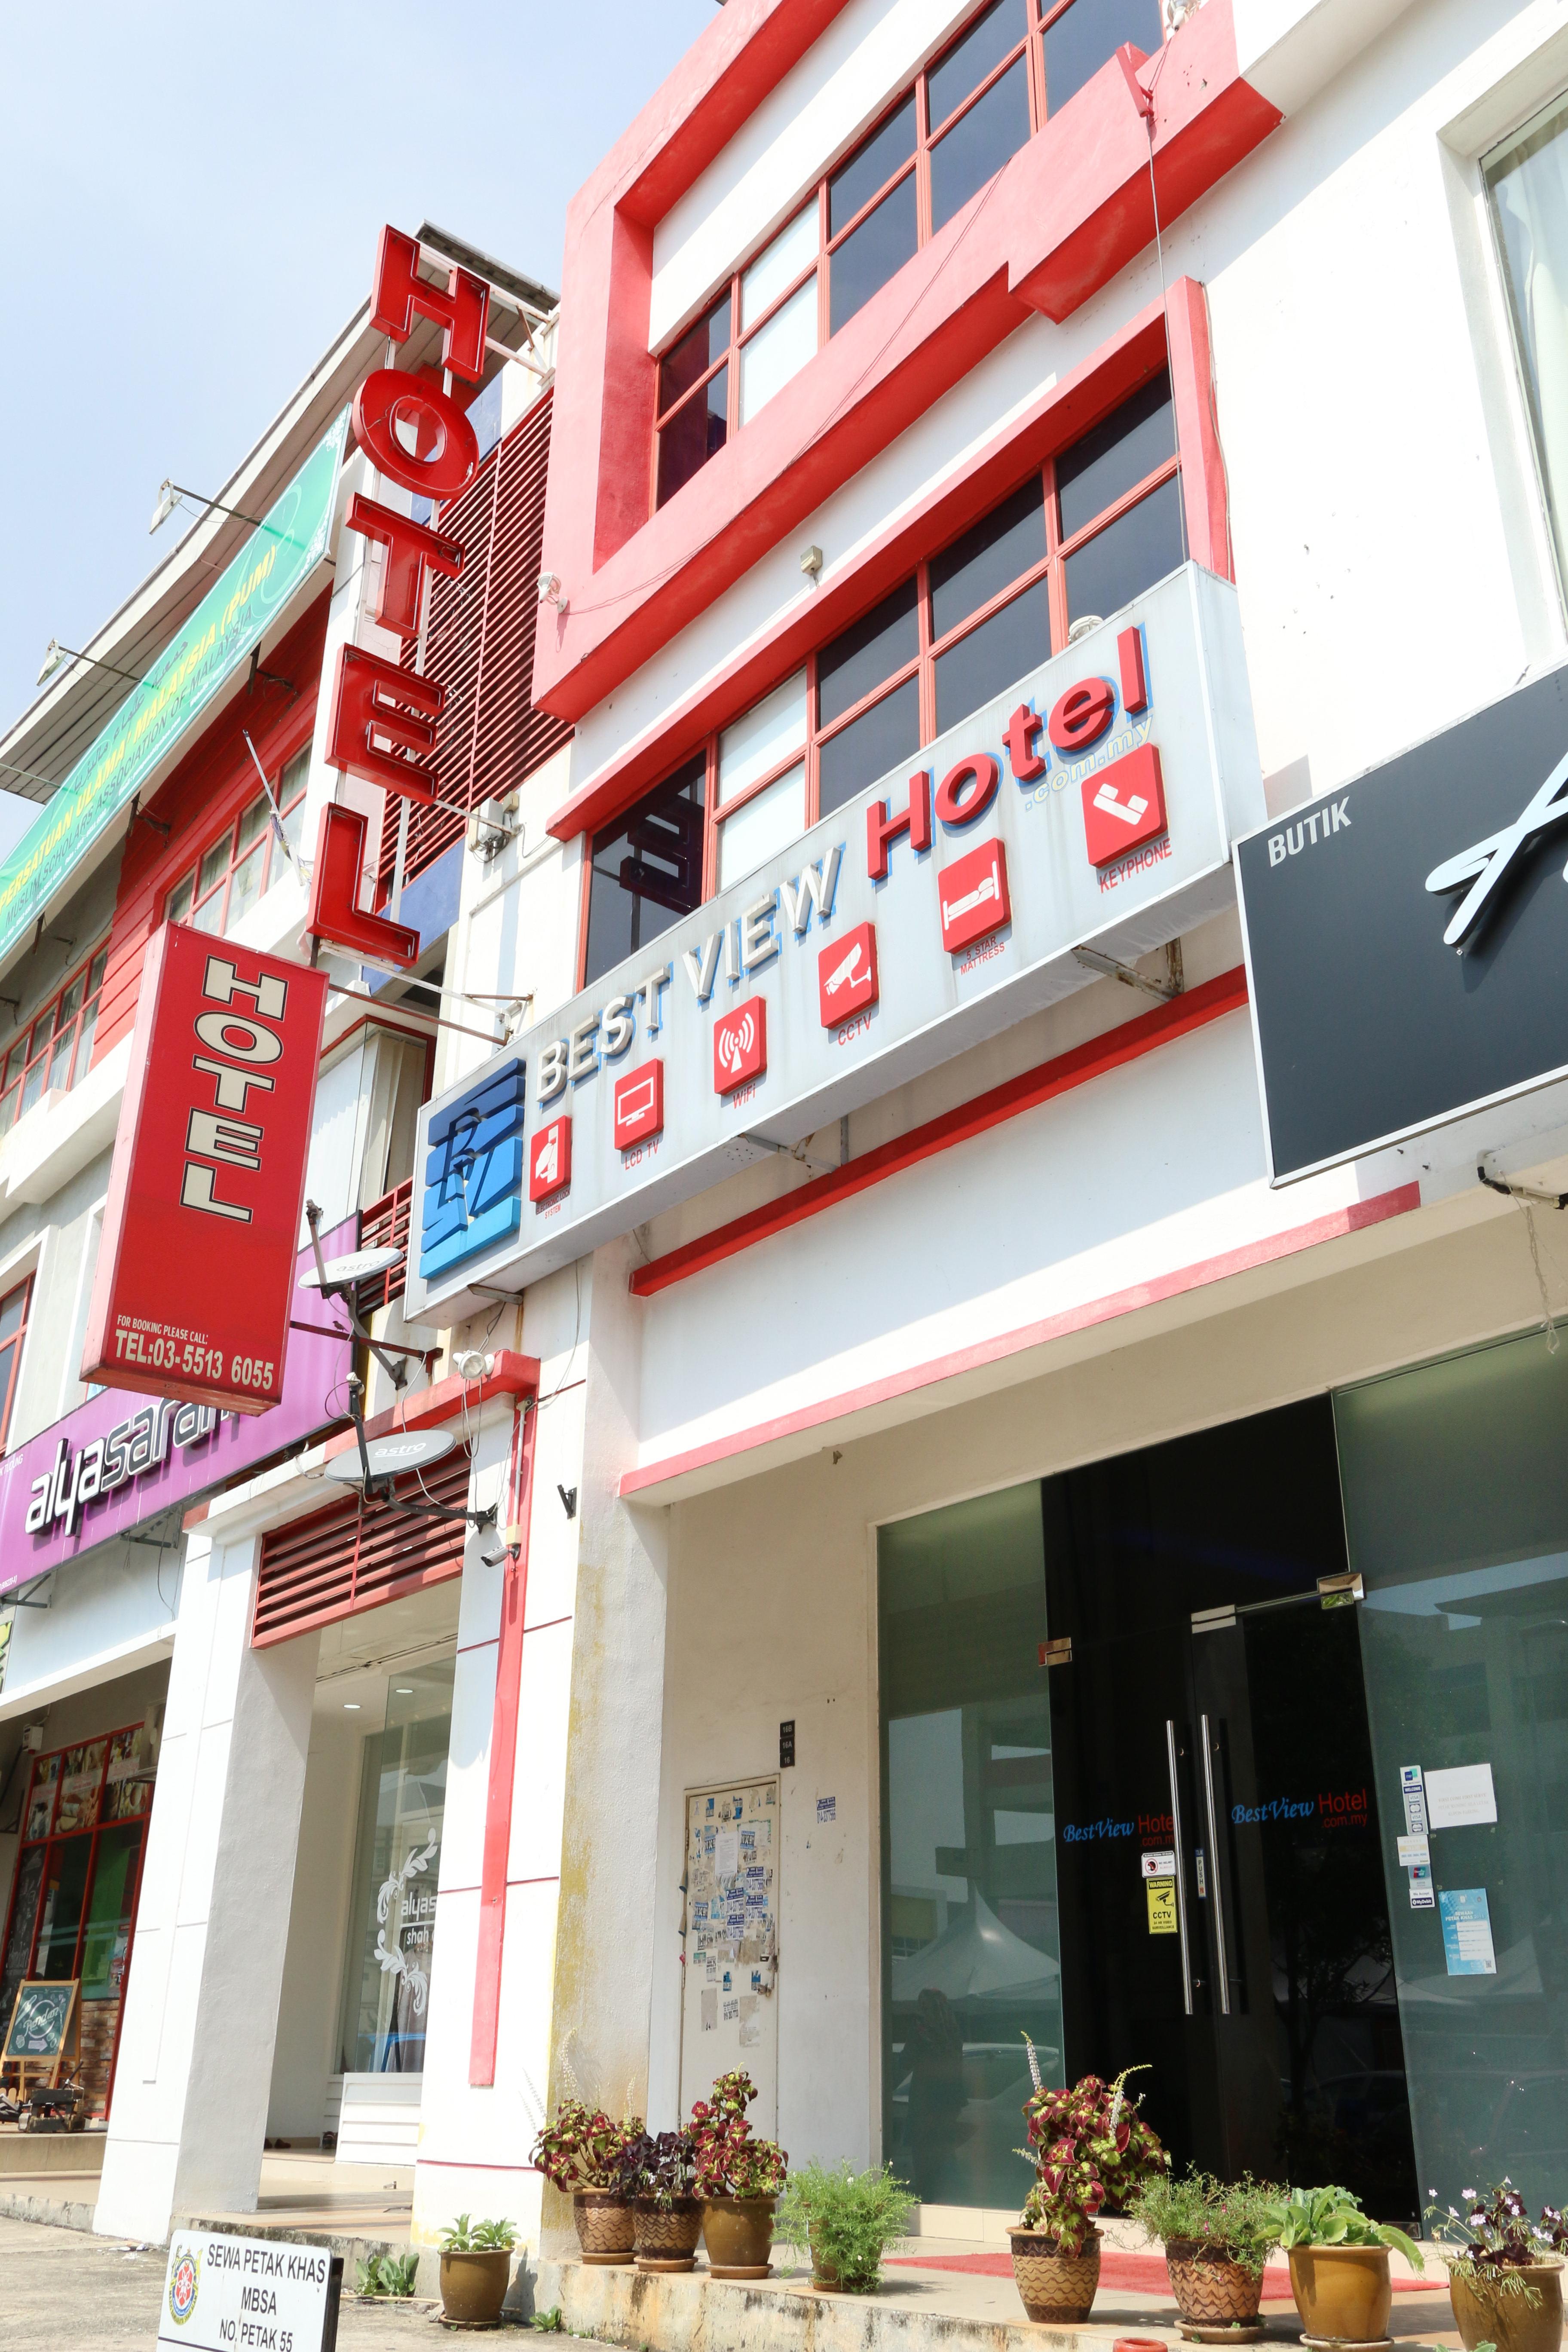 Best View Hotel Shah Alam @ UITM, I-City & Hospital, Kuala Lumpur